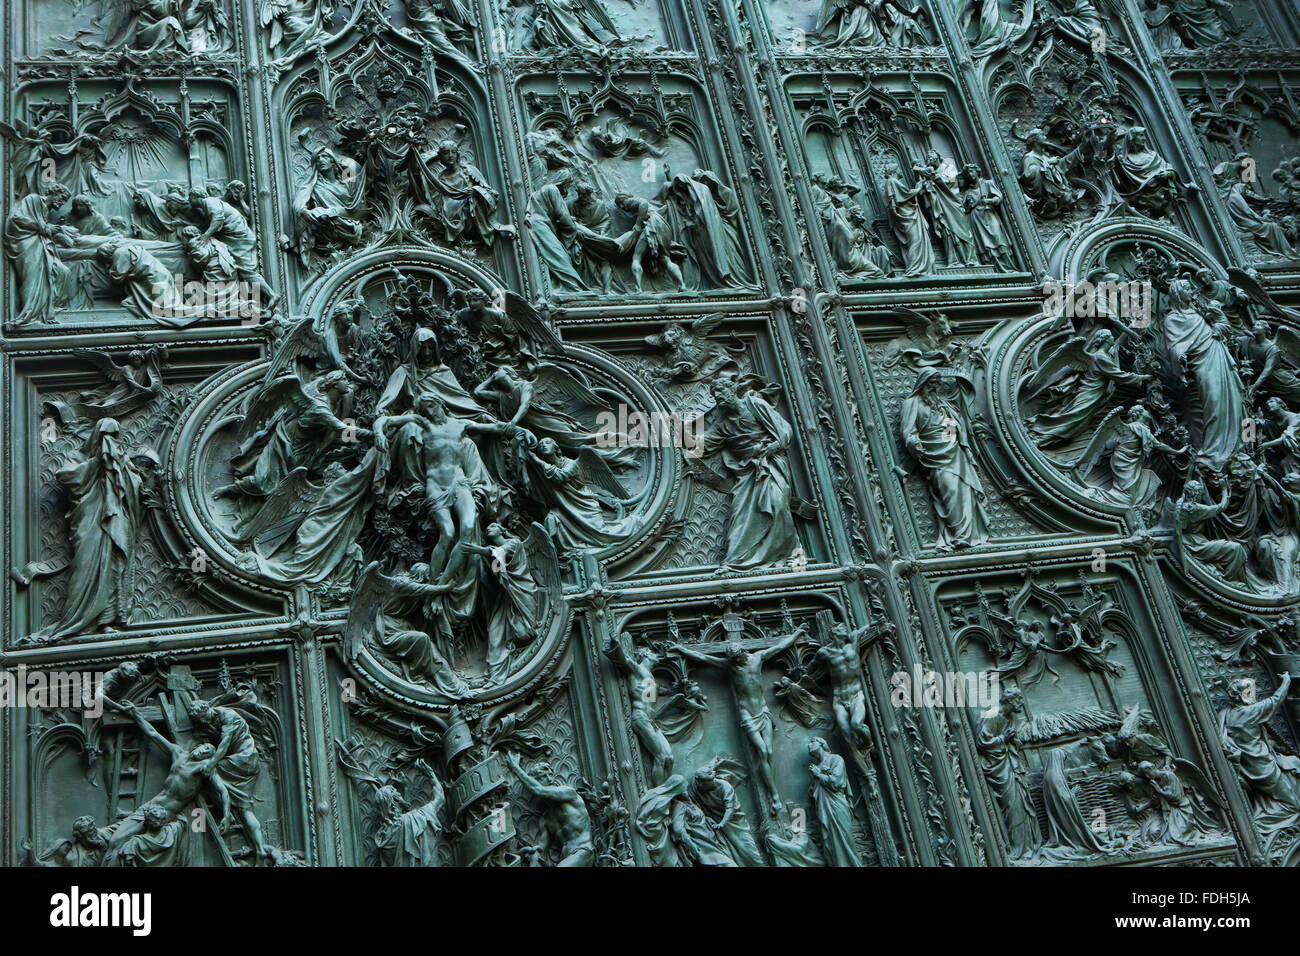 Main bronze door of the Milan Cathedral (Duomo di Milano) designed by Italian sculptor Ludovico Pogliaghi in Milan, - Stock Image